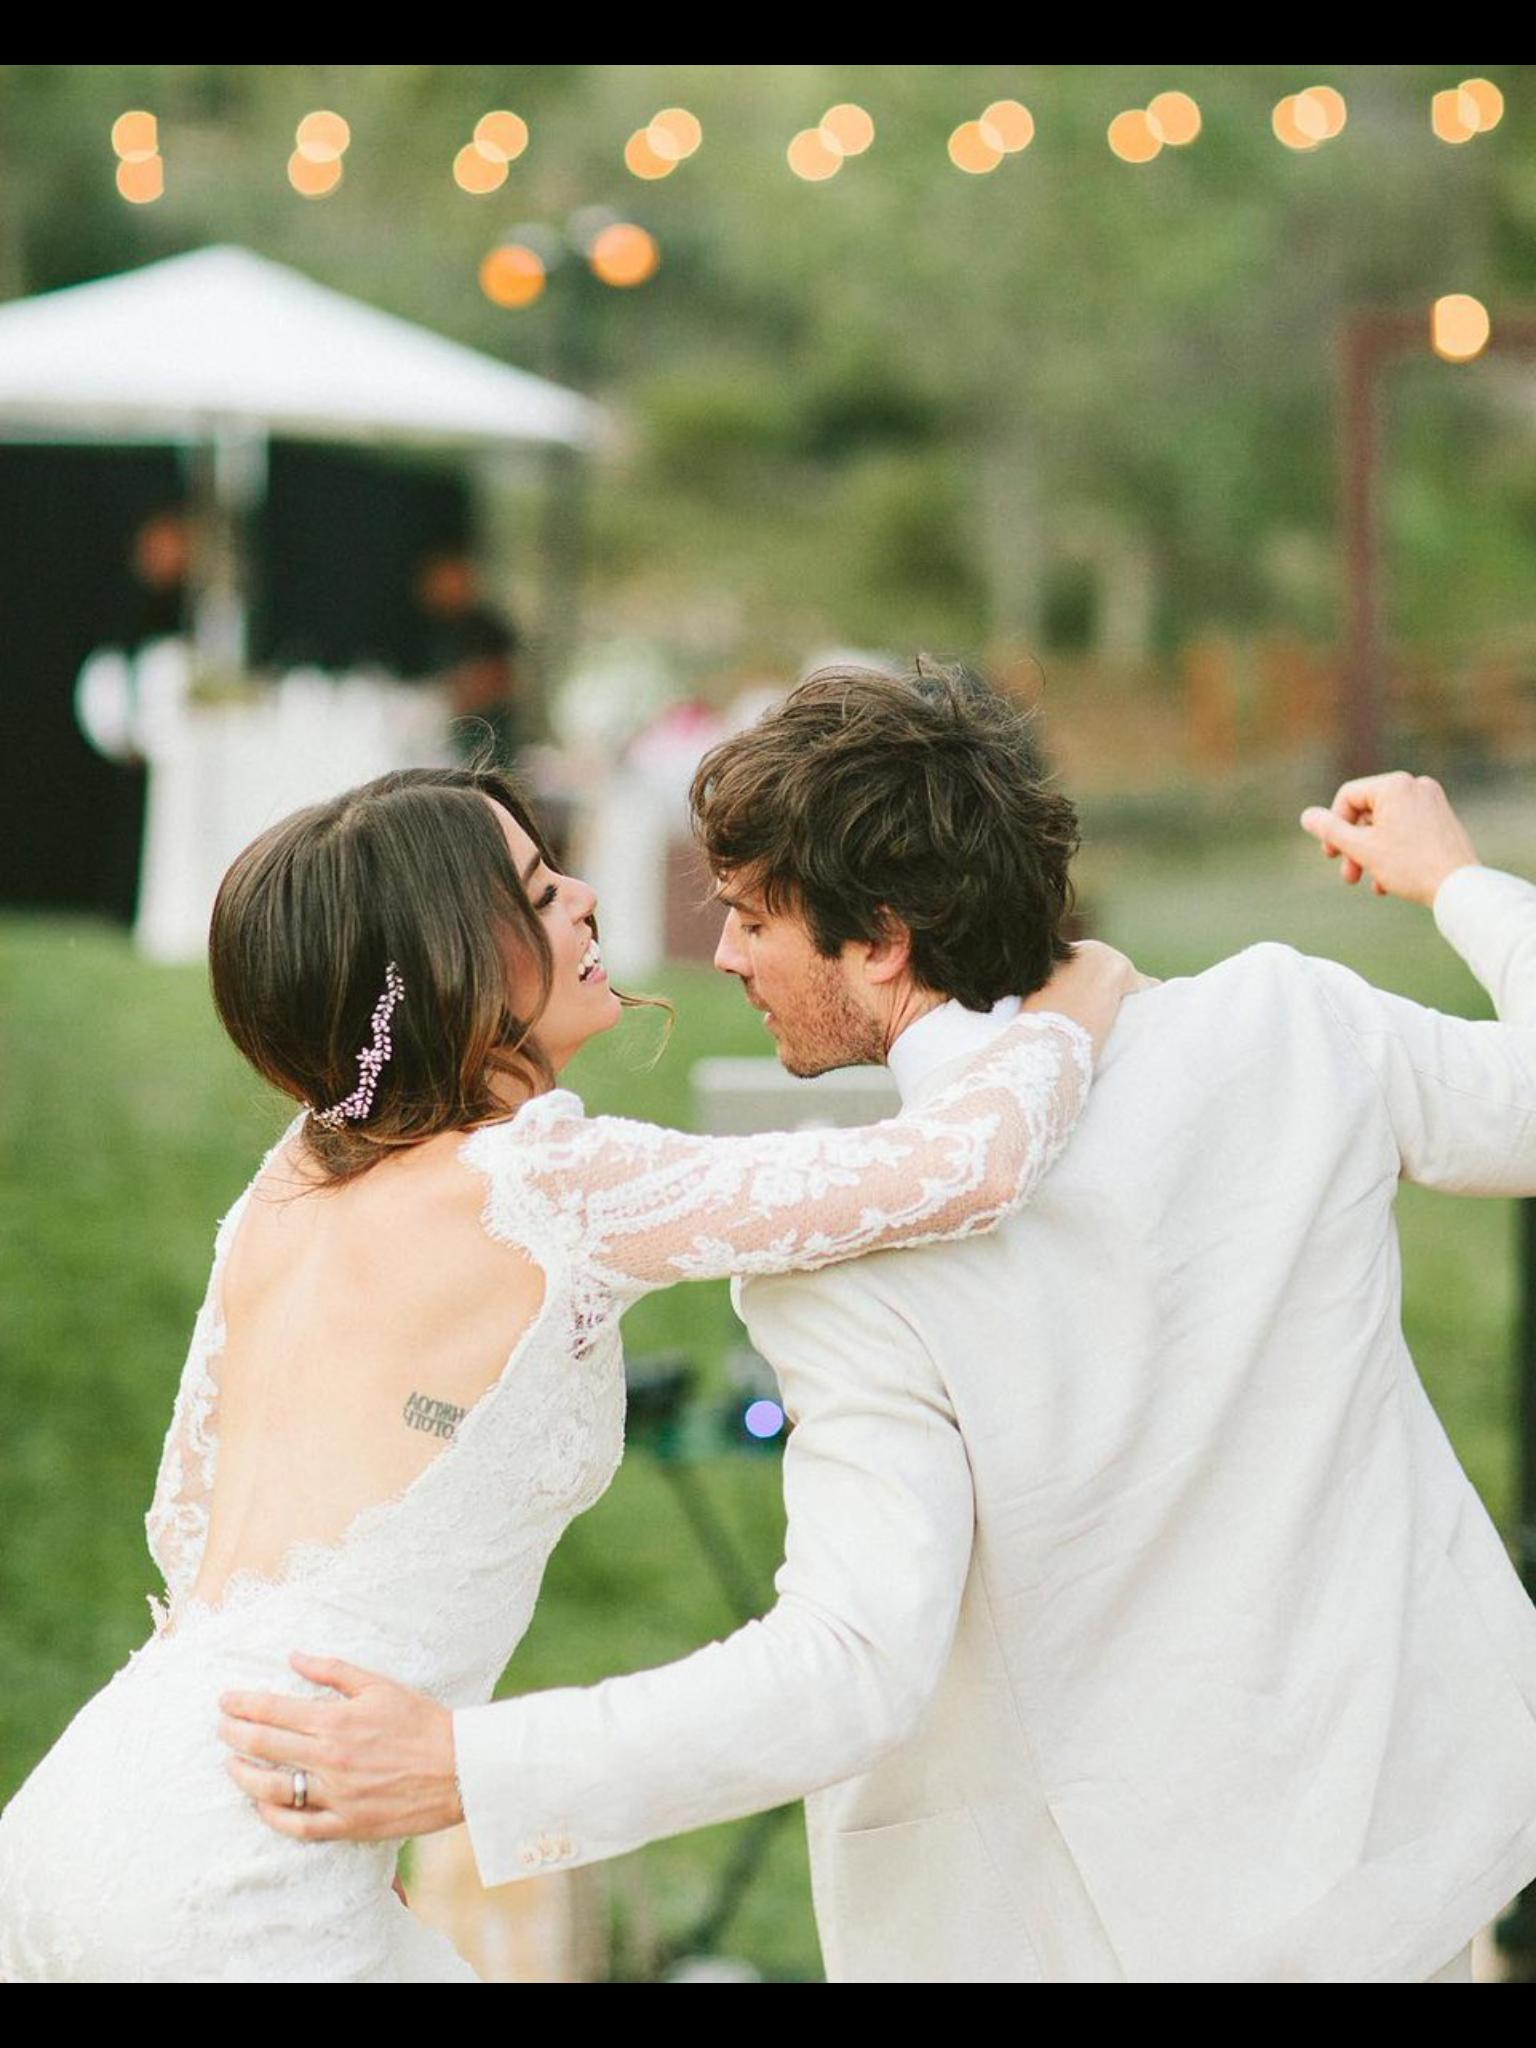 Nikki Reed And Ian Somerhalder Ian Somerhalder Wedding Celebrity Weddings Ian And Nikki